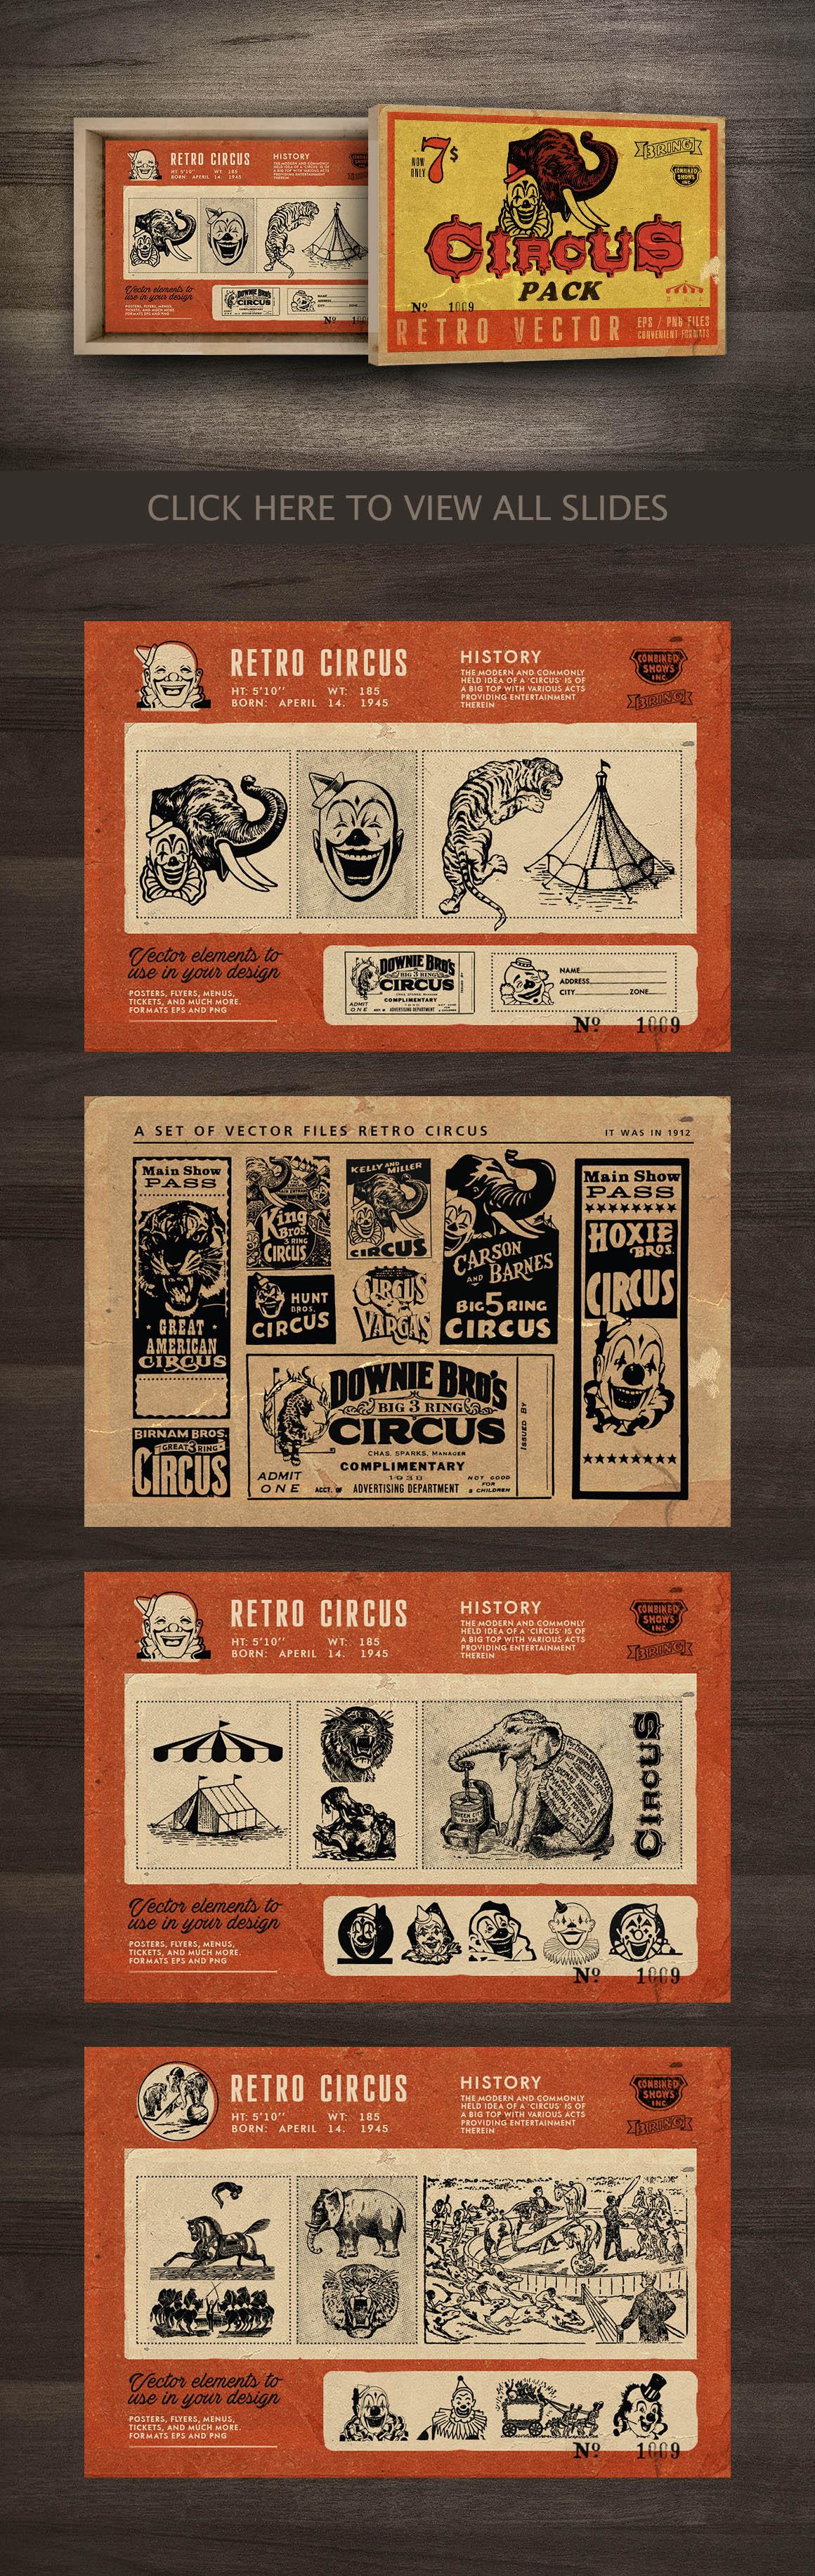 Retro-Graphics-Bundle-dealjumbo-10